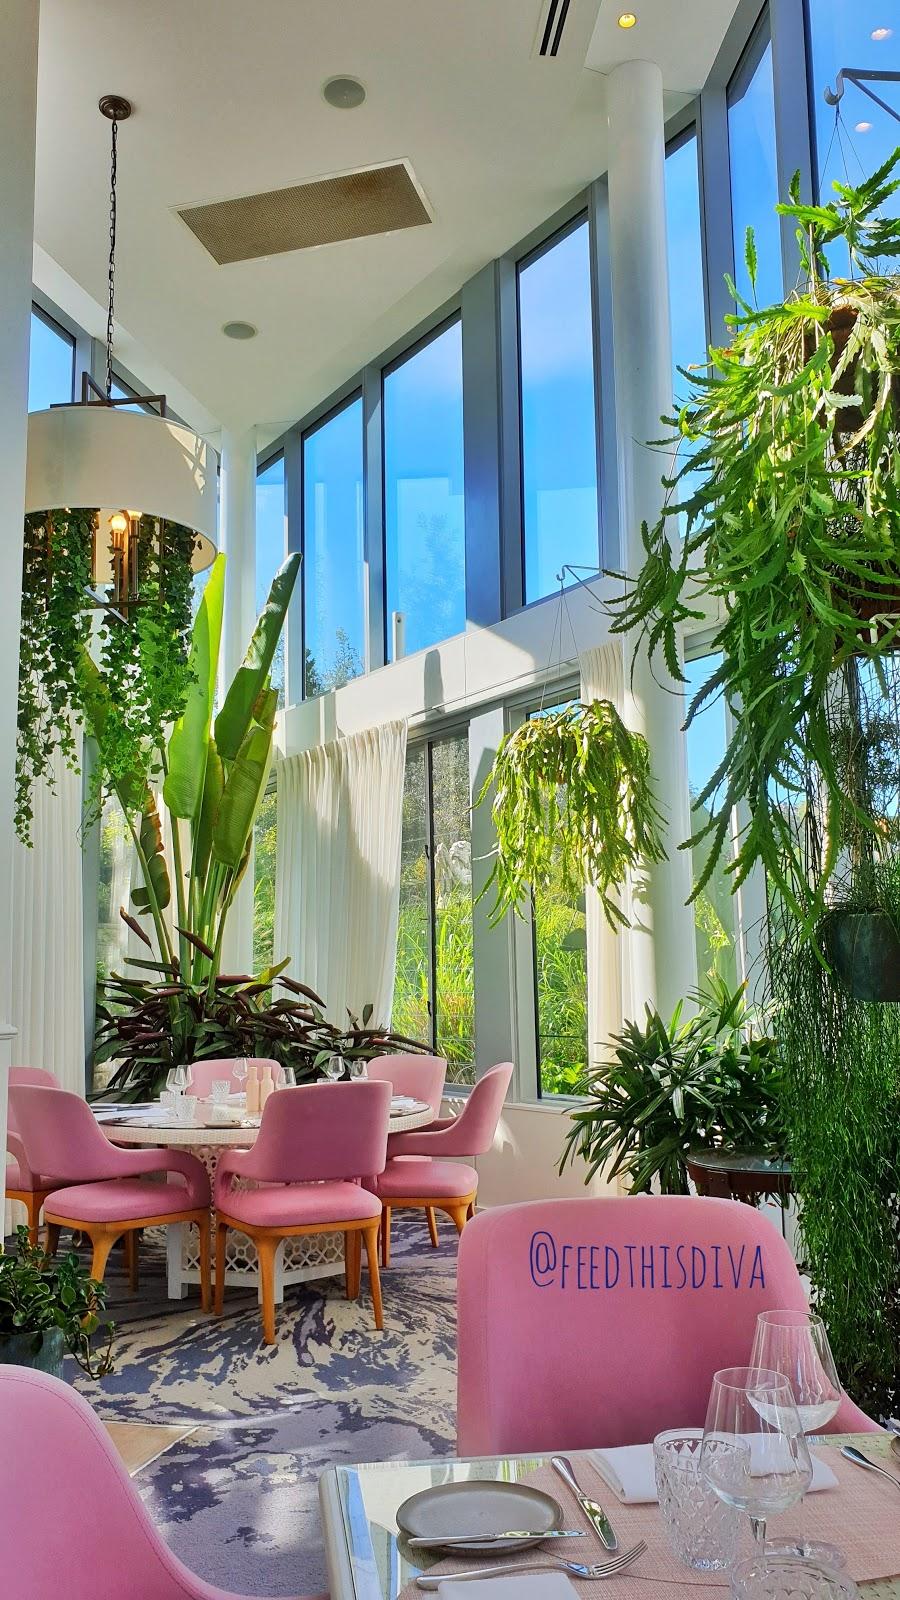 The Botanica Vaucluse | restaurant | 2 Laguna St, Vaucluse NSW 2030, Australia | 0291918989 OR +61 2 9191 8989